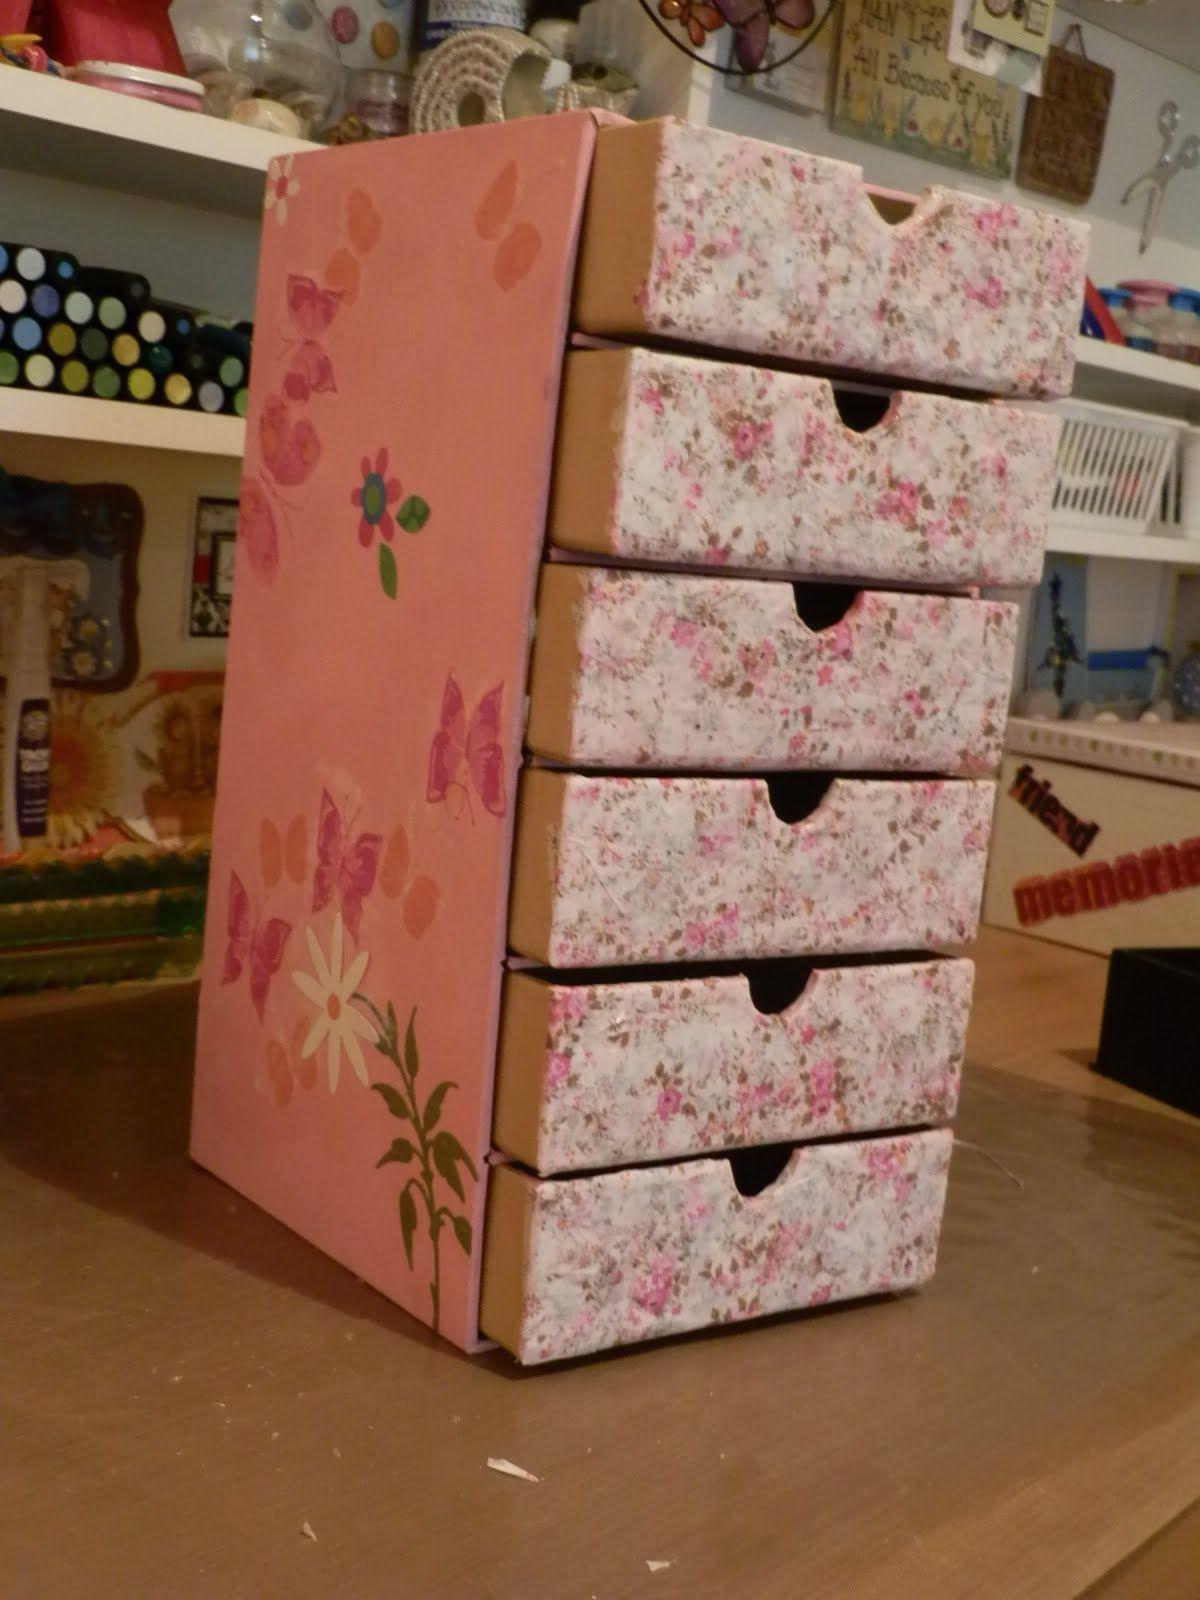 Diy Cardboard Box Storage These Are Cardboard Drawer Units With